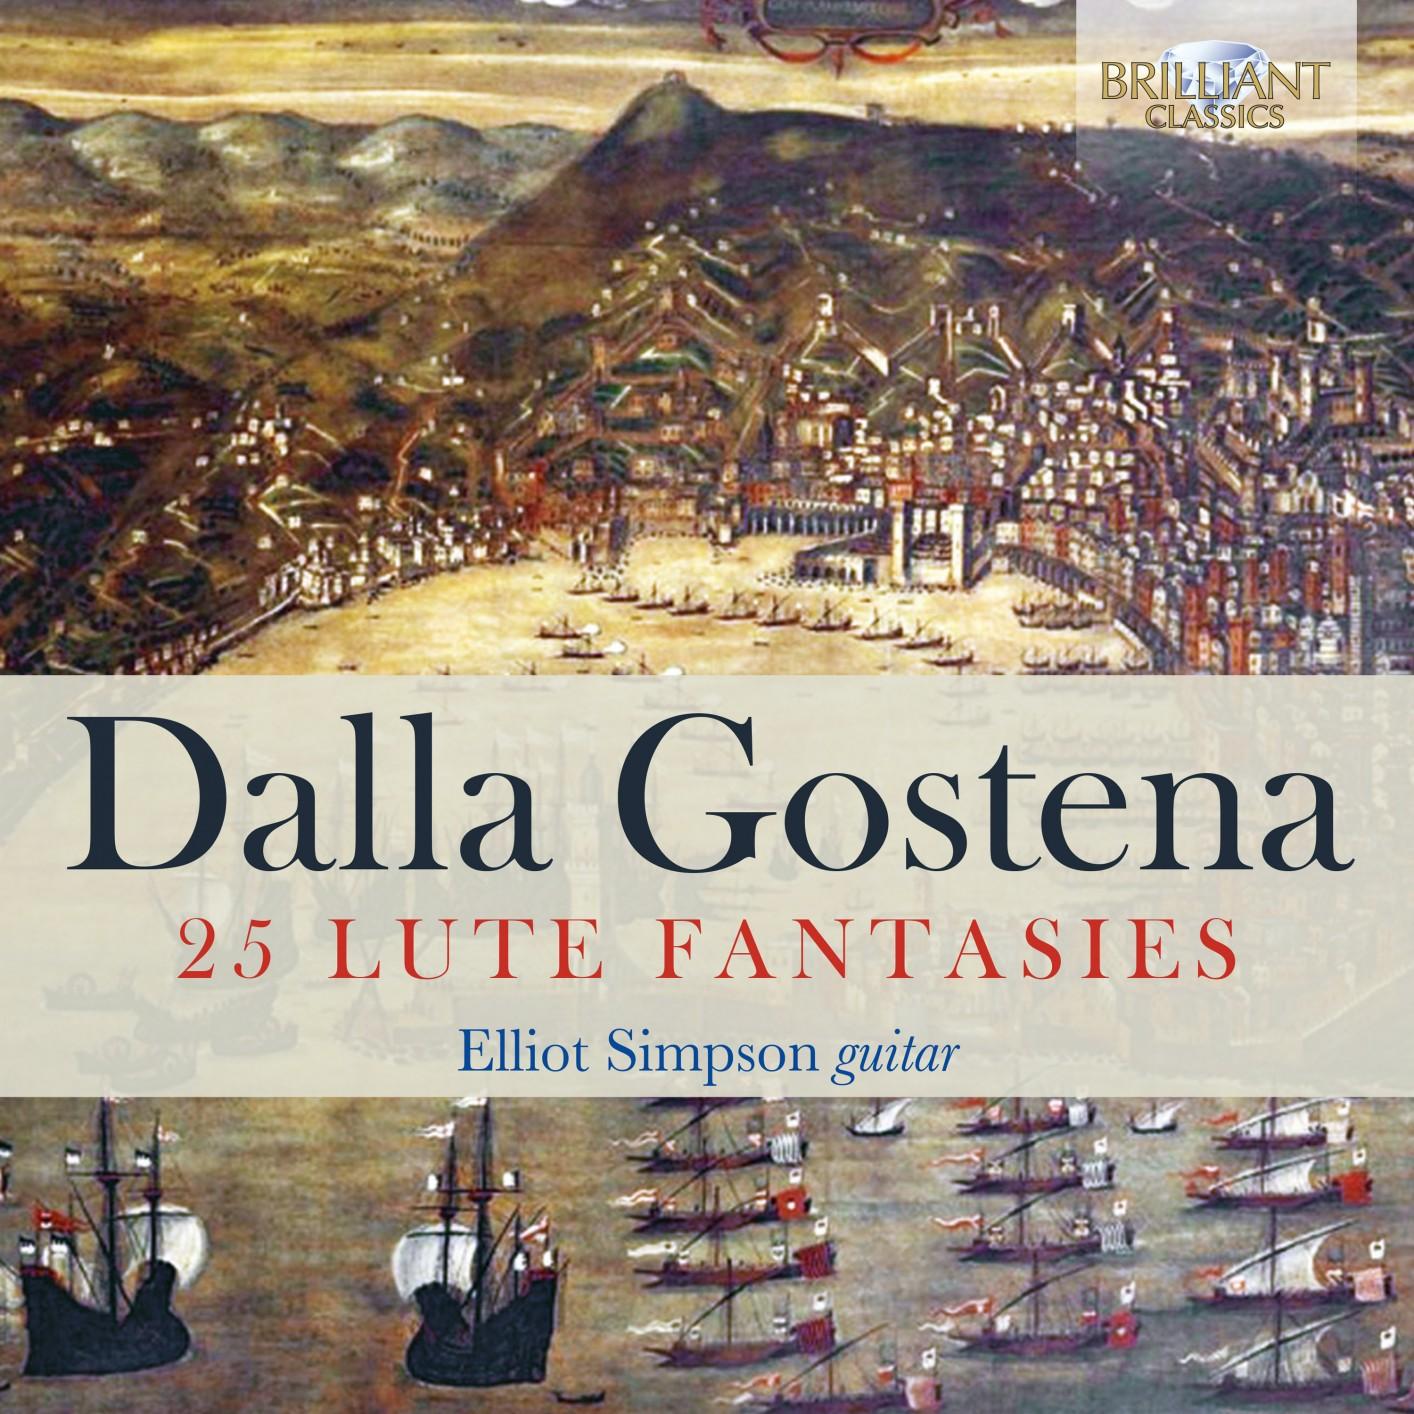 Elliot Simpson - Dalla Gostena: 25 Lute Fantasies (2019)